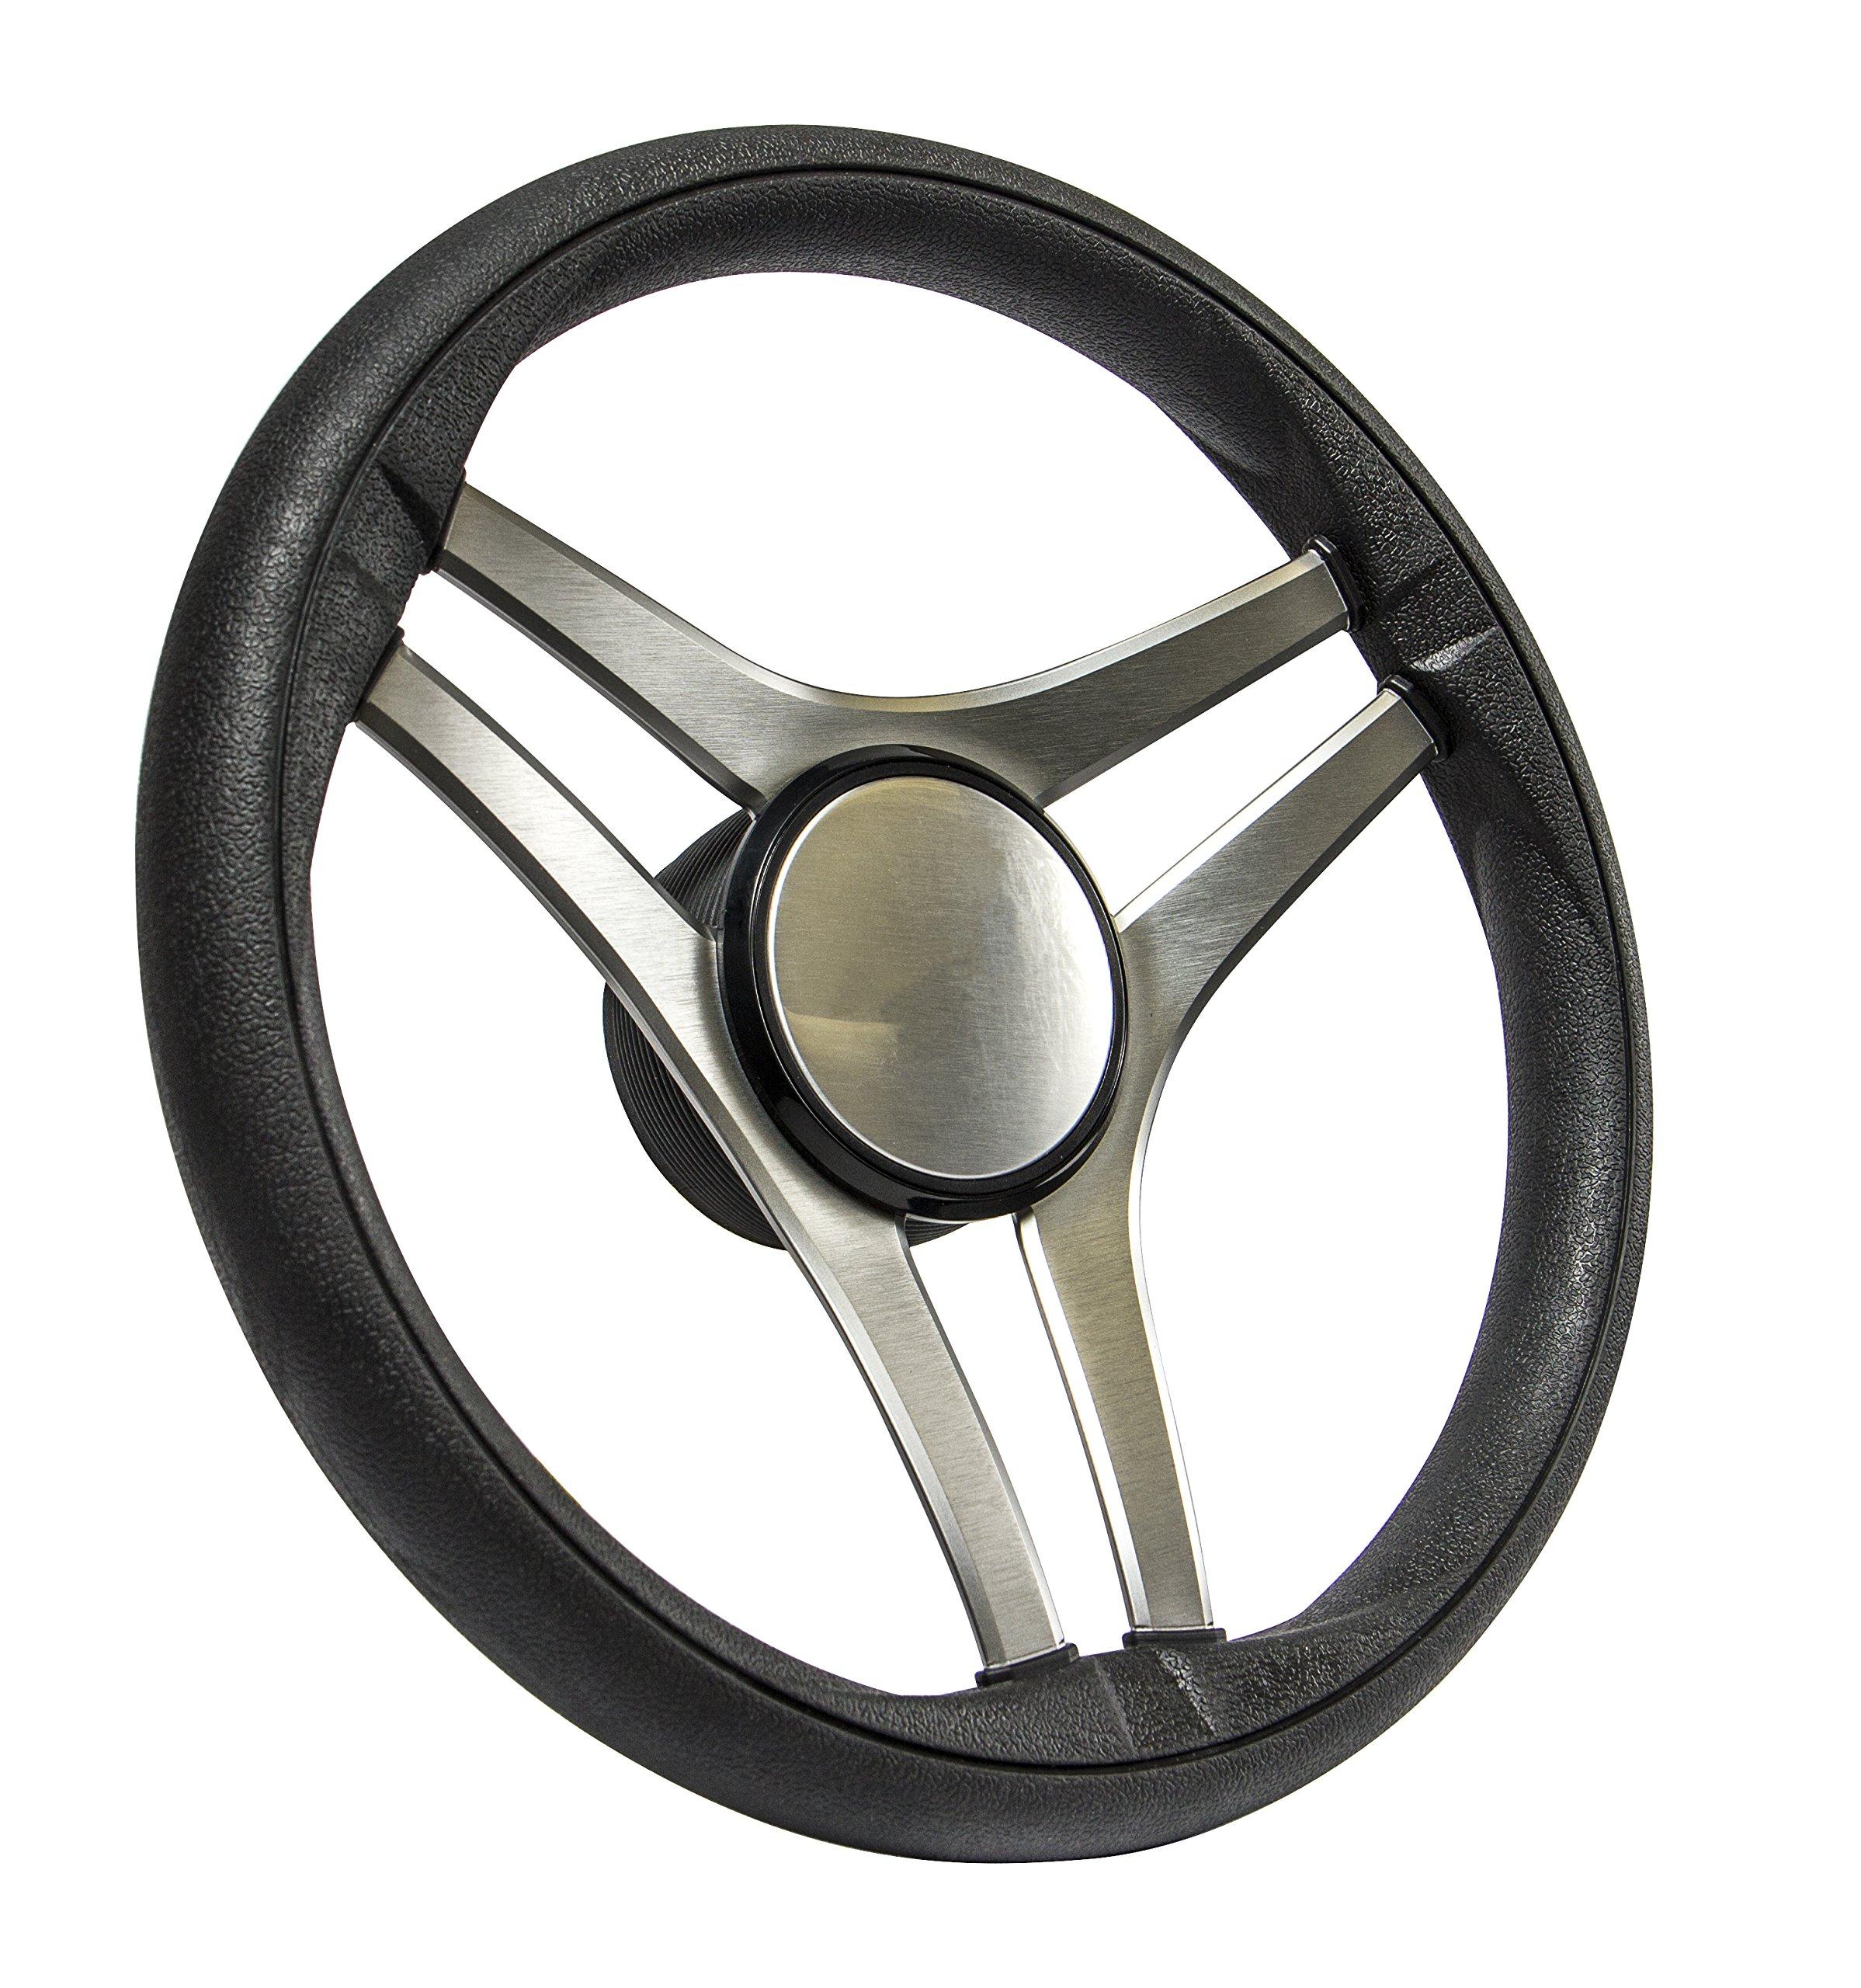 SeaStar Molinara SW60300P Steering Wheel, Molinara 13-1/2 inch, 3 Spoke Equidistant by SeaStar